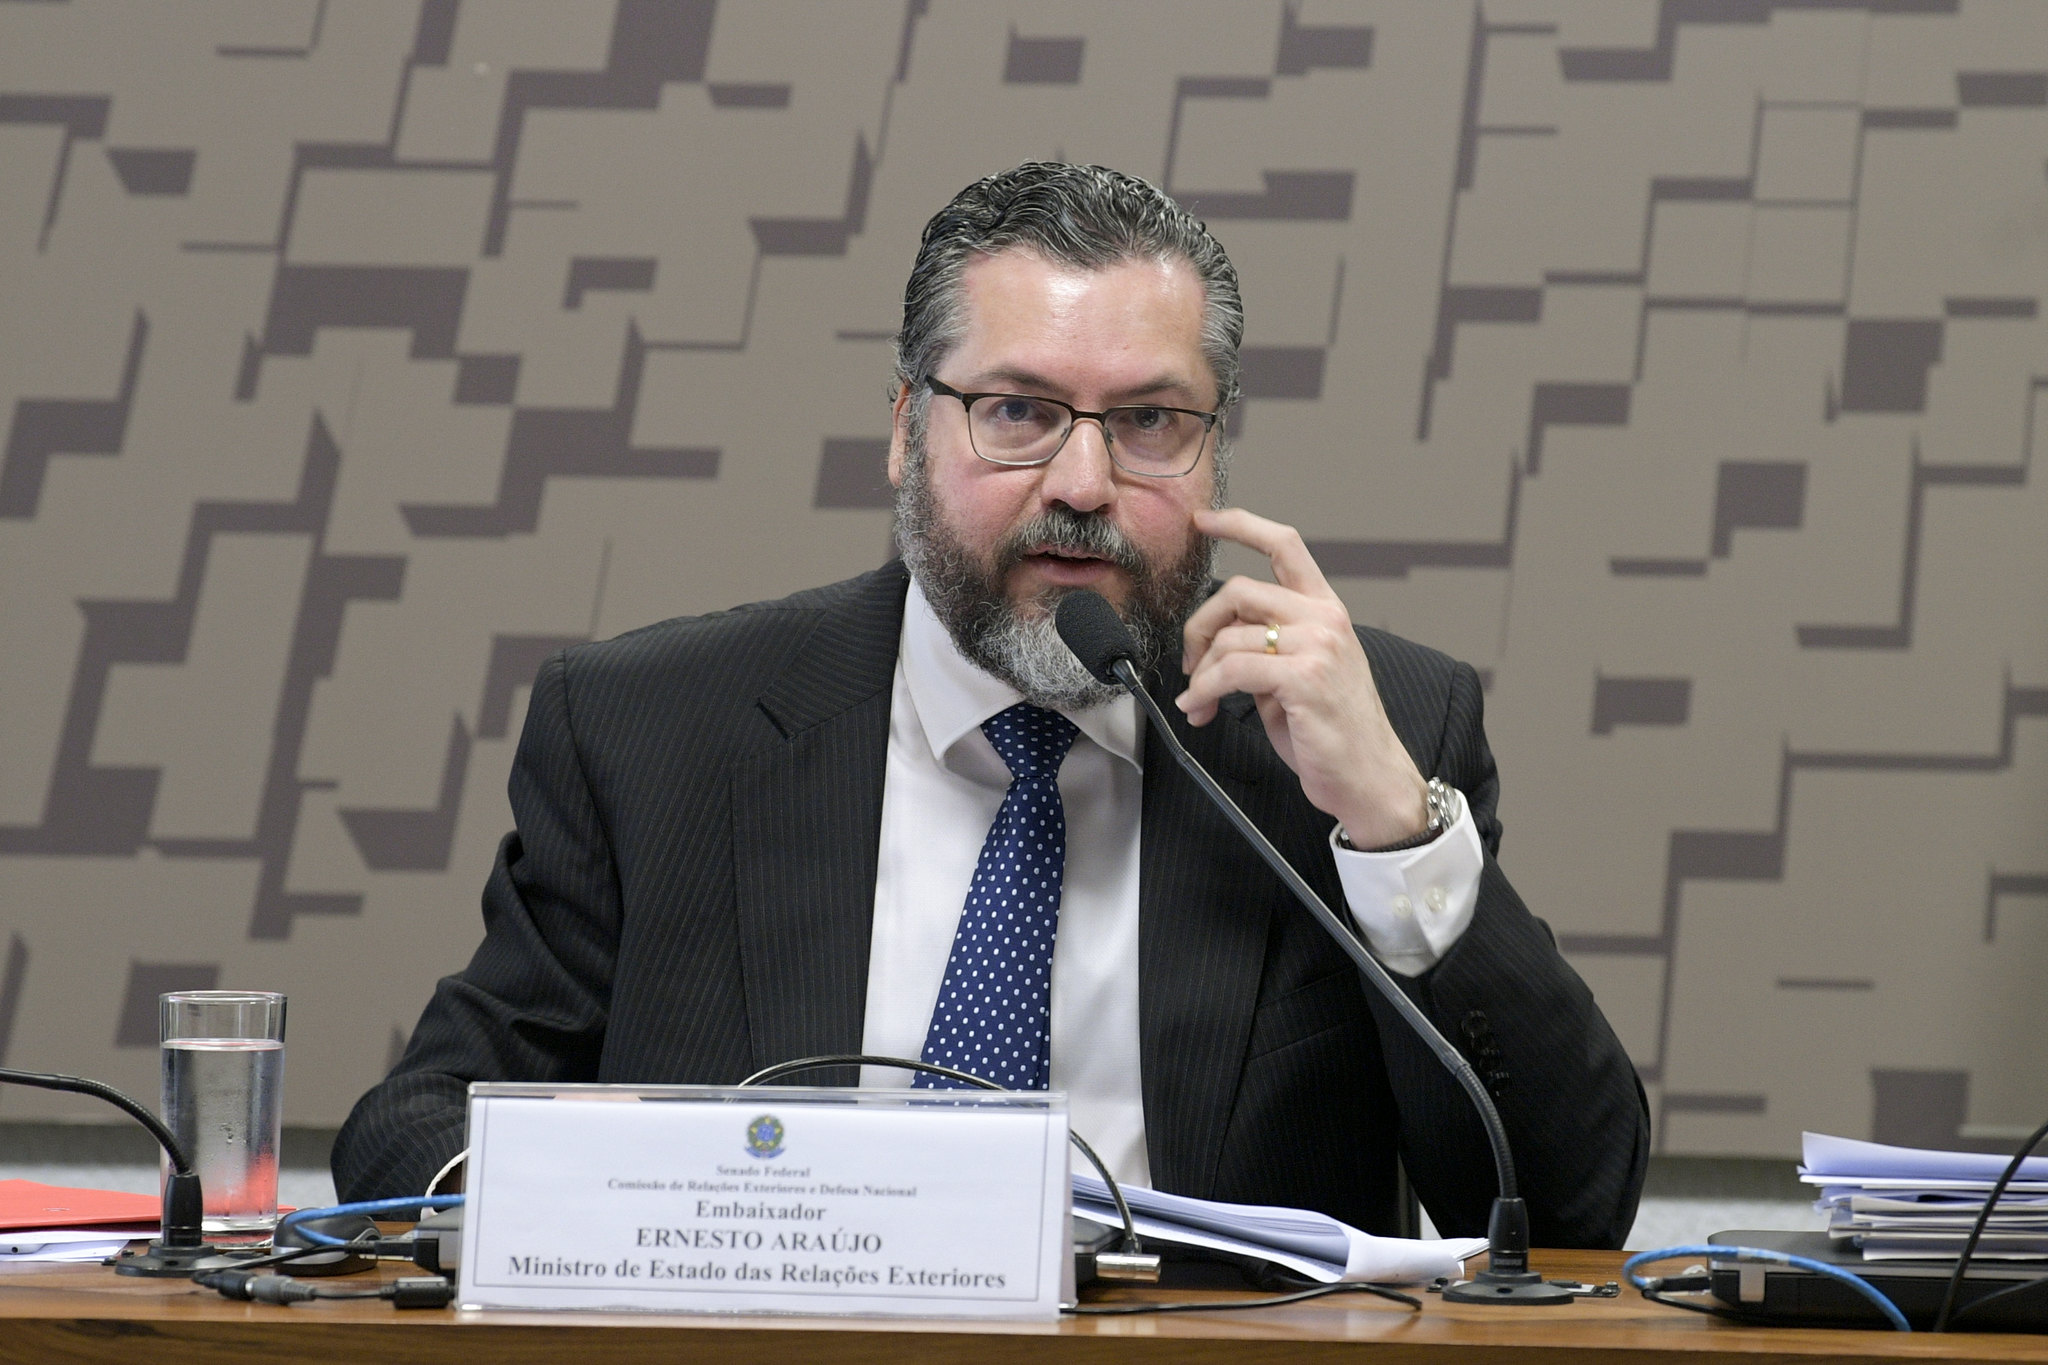 IMAGEM: Antigo bunker olavista muda de perfil após saída de Ernesto Araújo